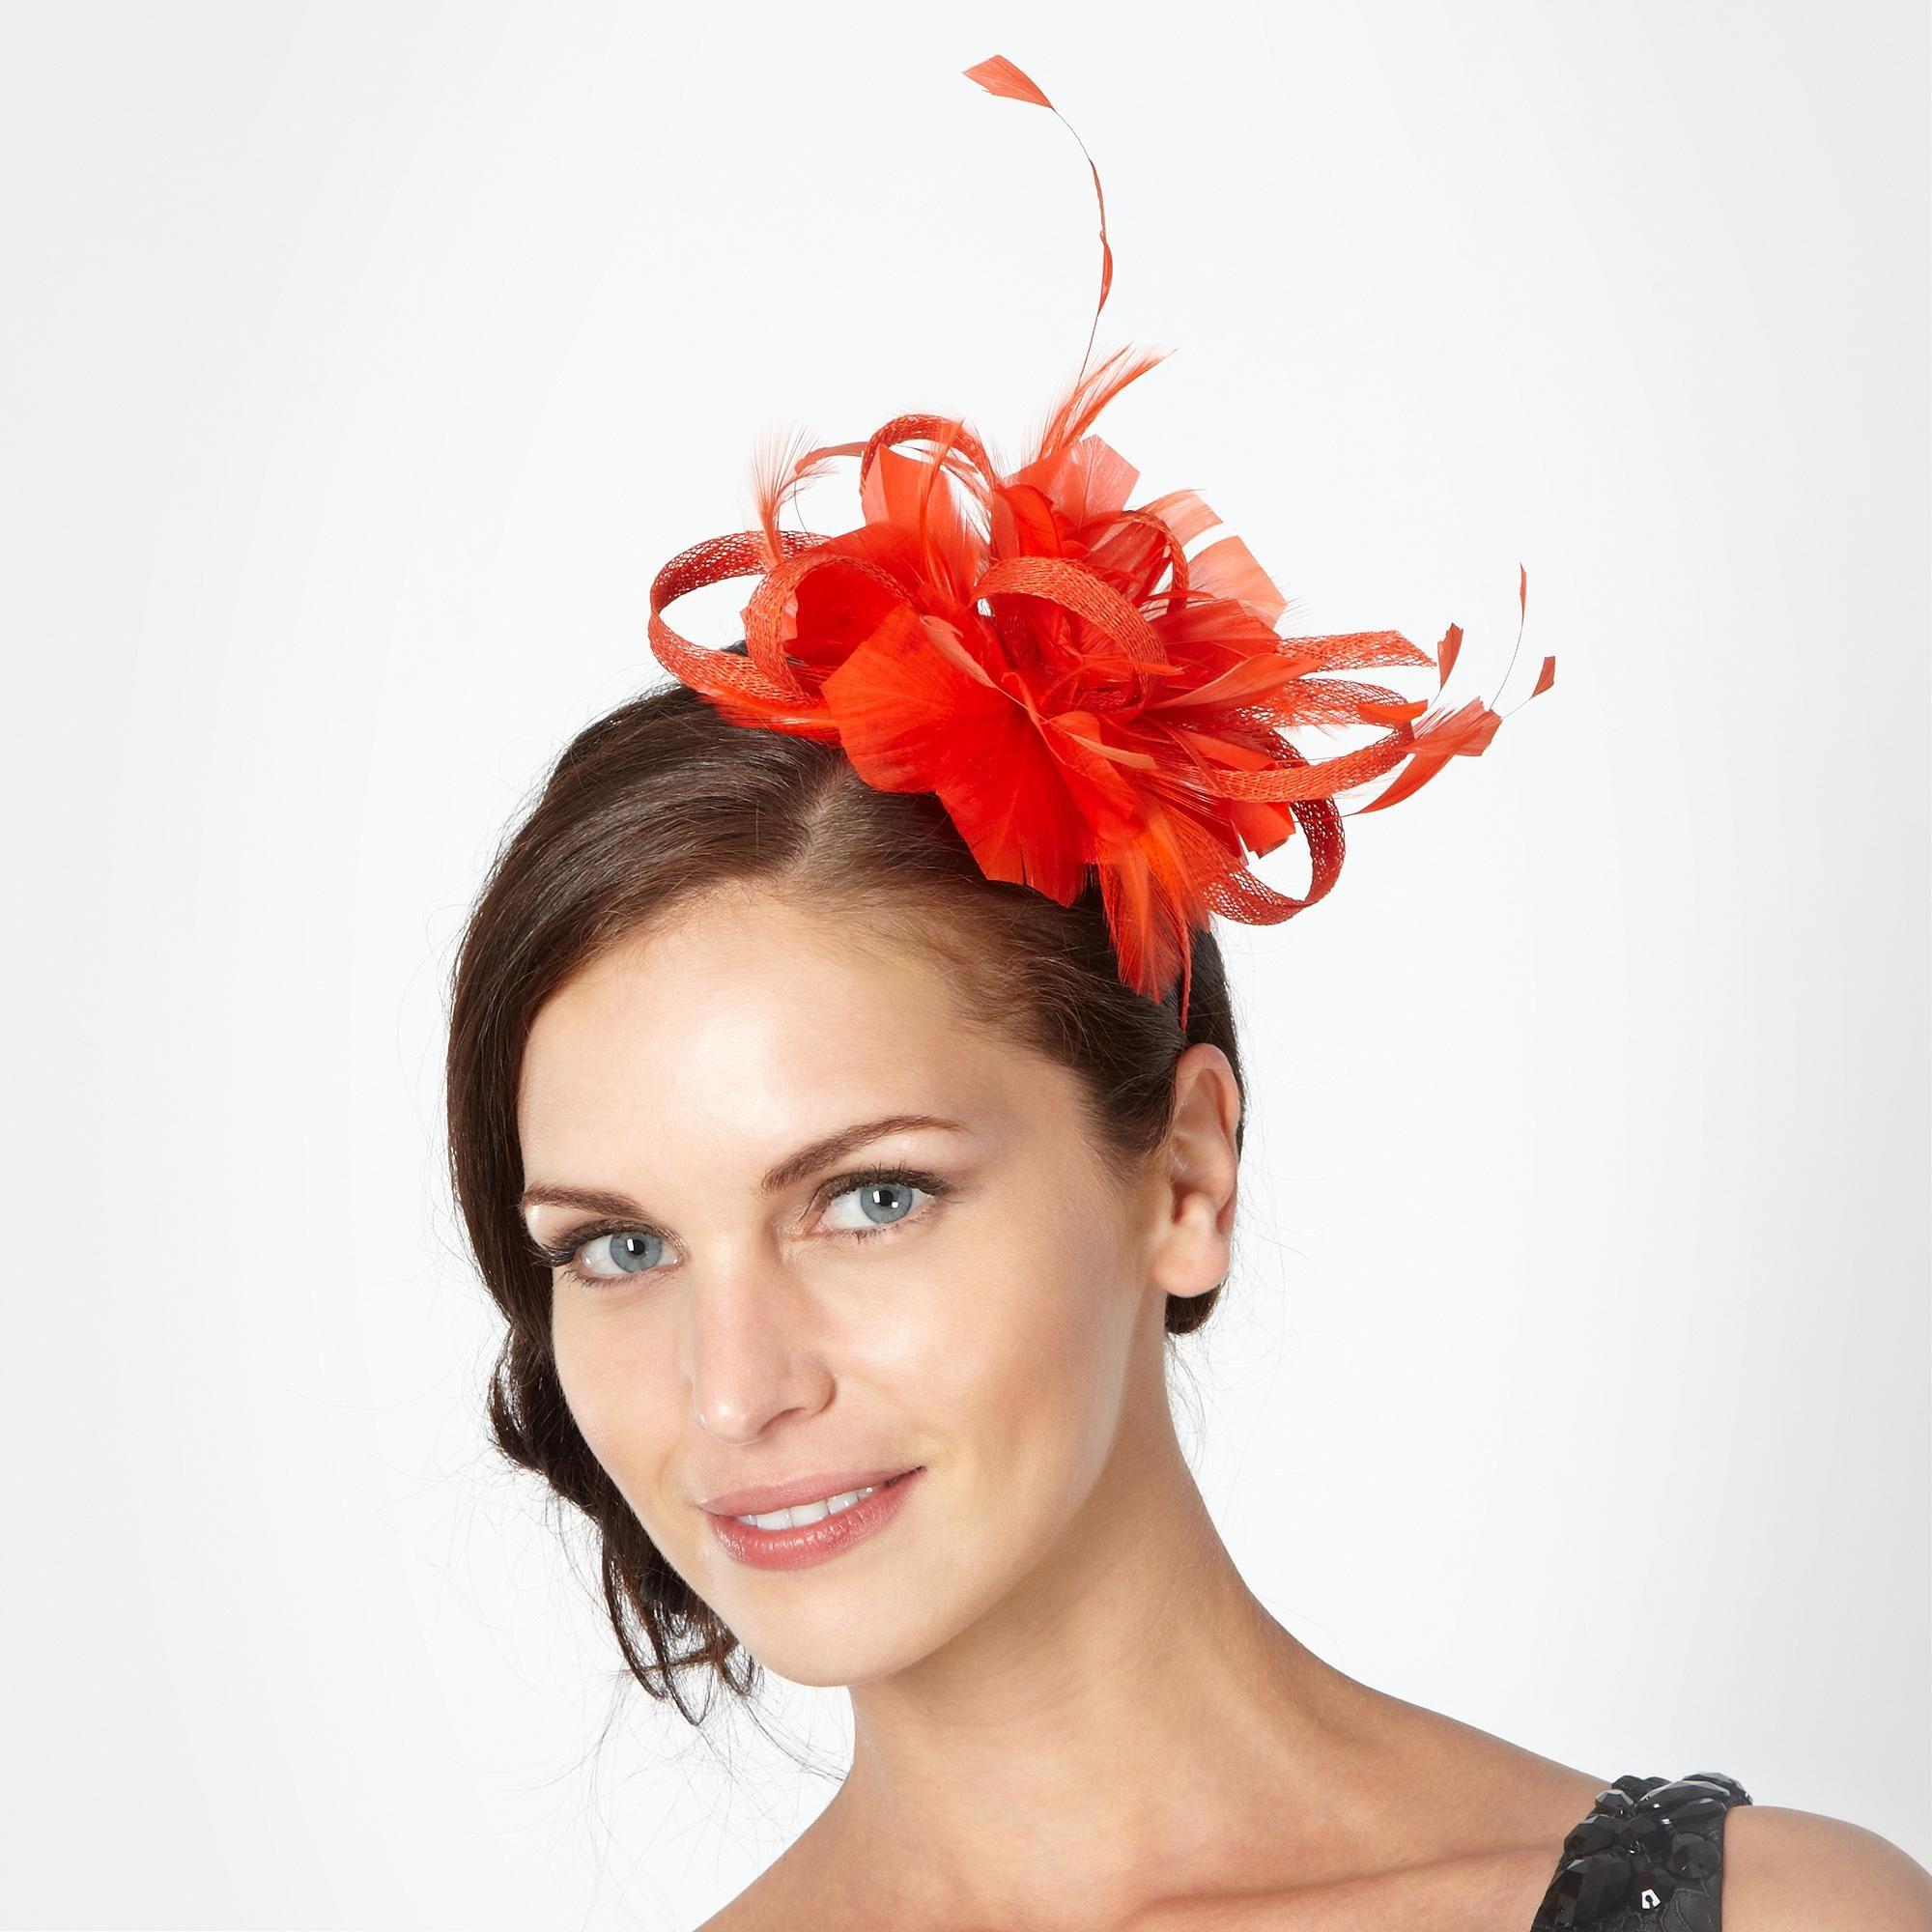 designer orange floral feather headband - hats & fascinators